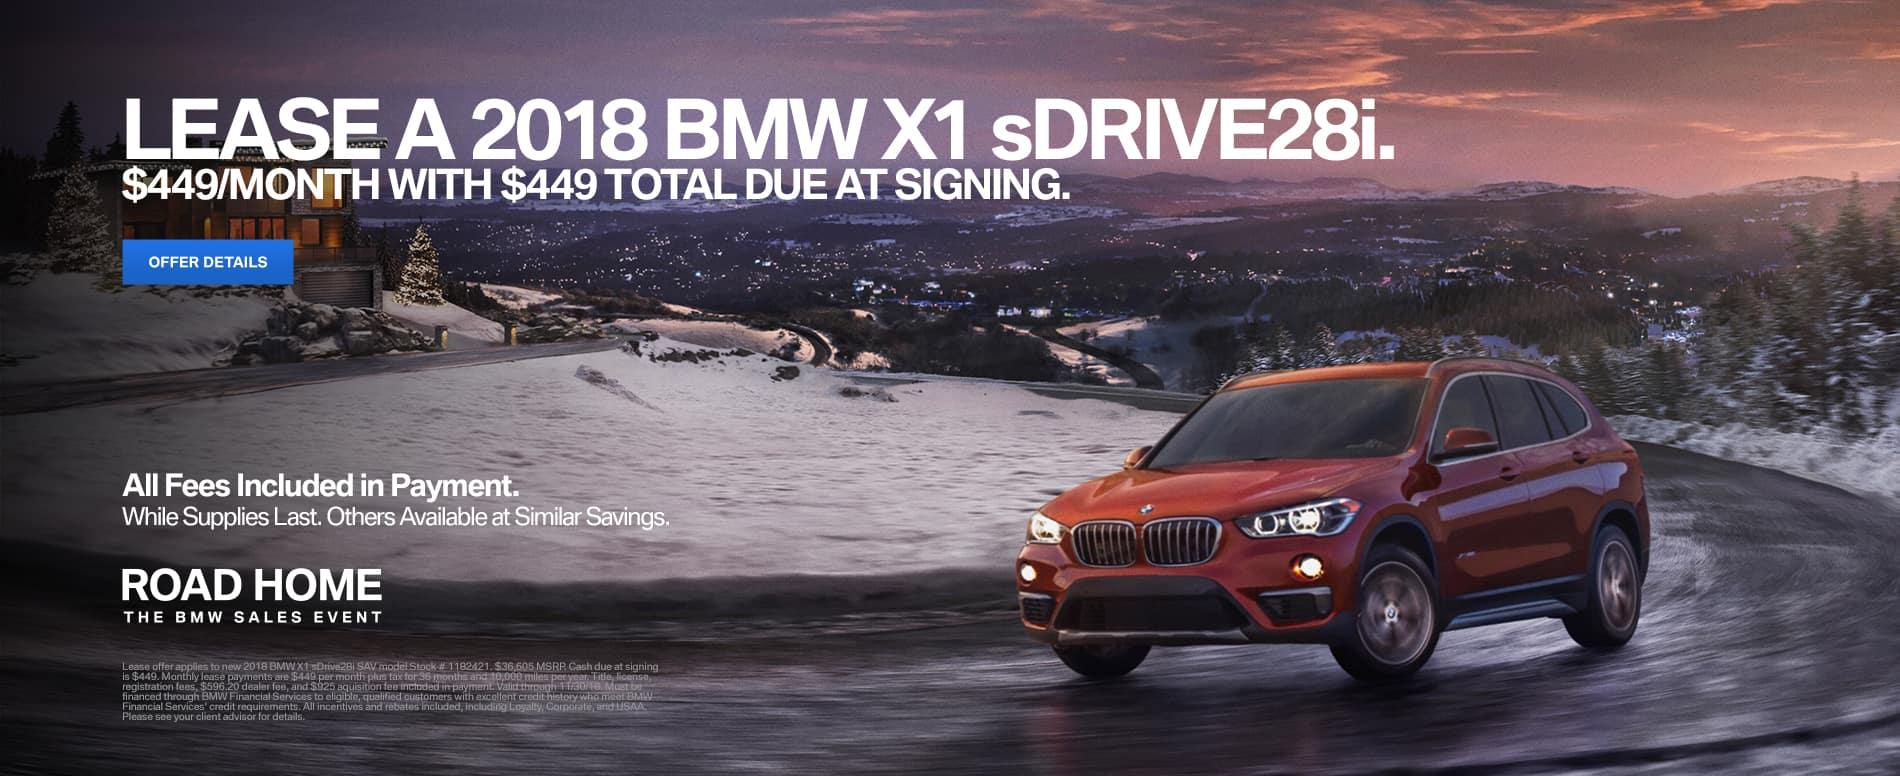 2018 BMW X1 Lease Offer